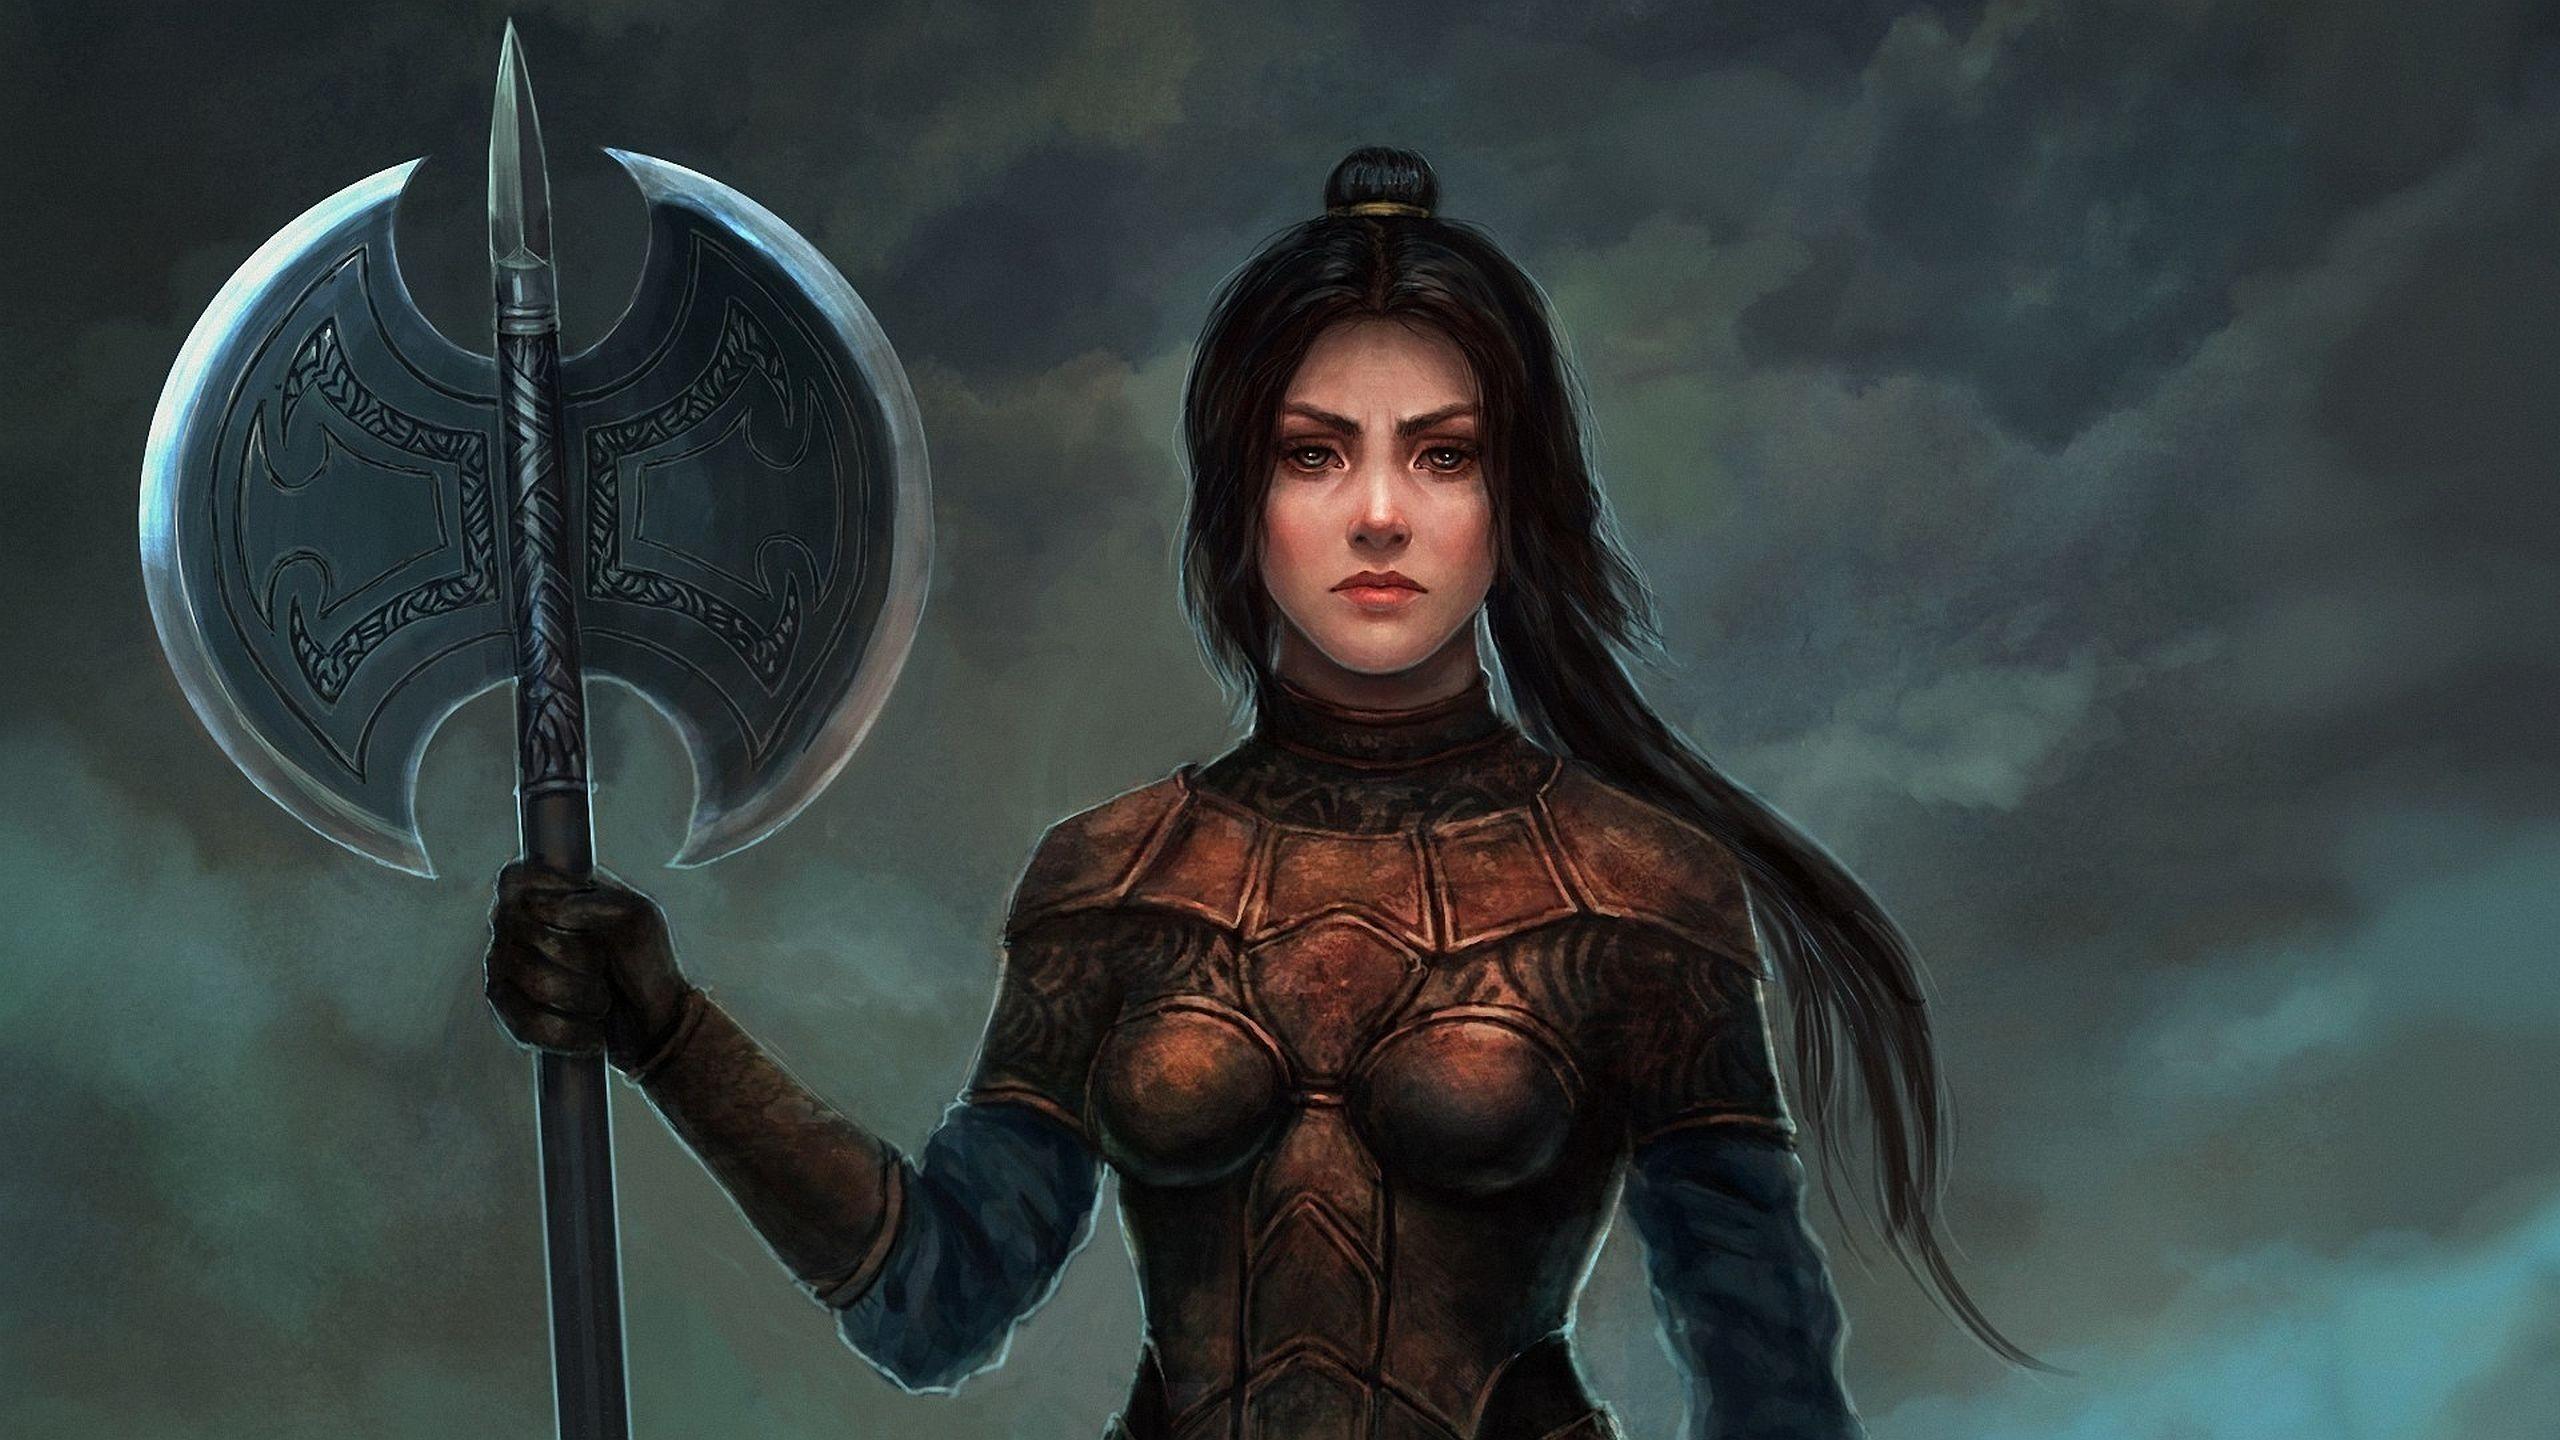 Woman warrior desktop wallpaper 13942